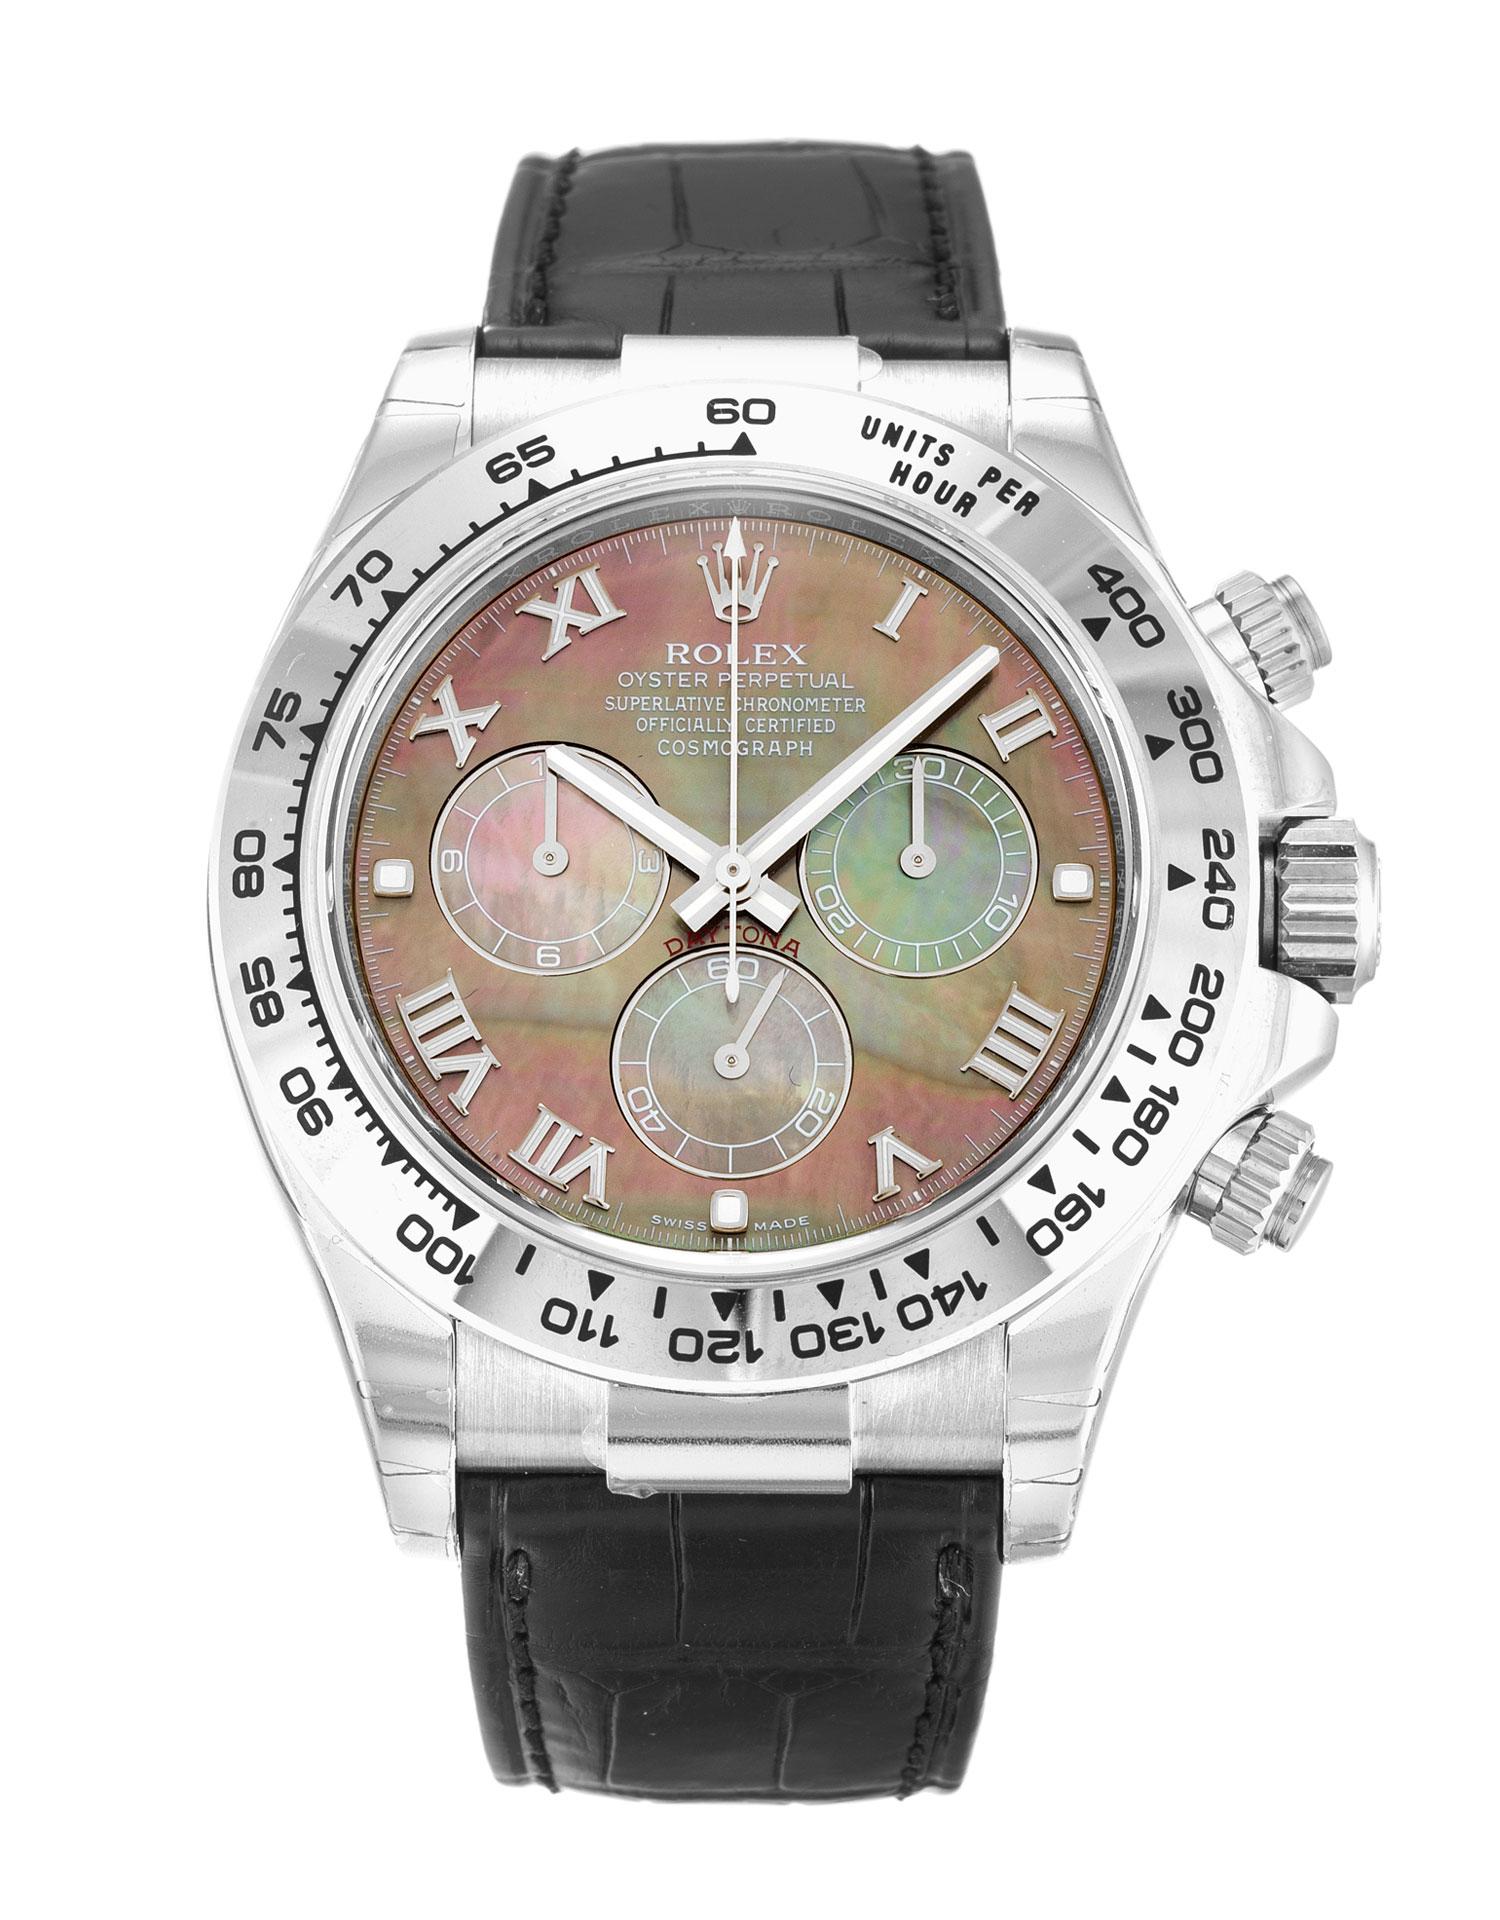 Rolex Cosmograph Daytona 116519 40MM Black Dial width=500